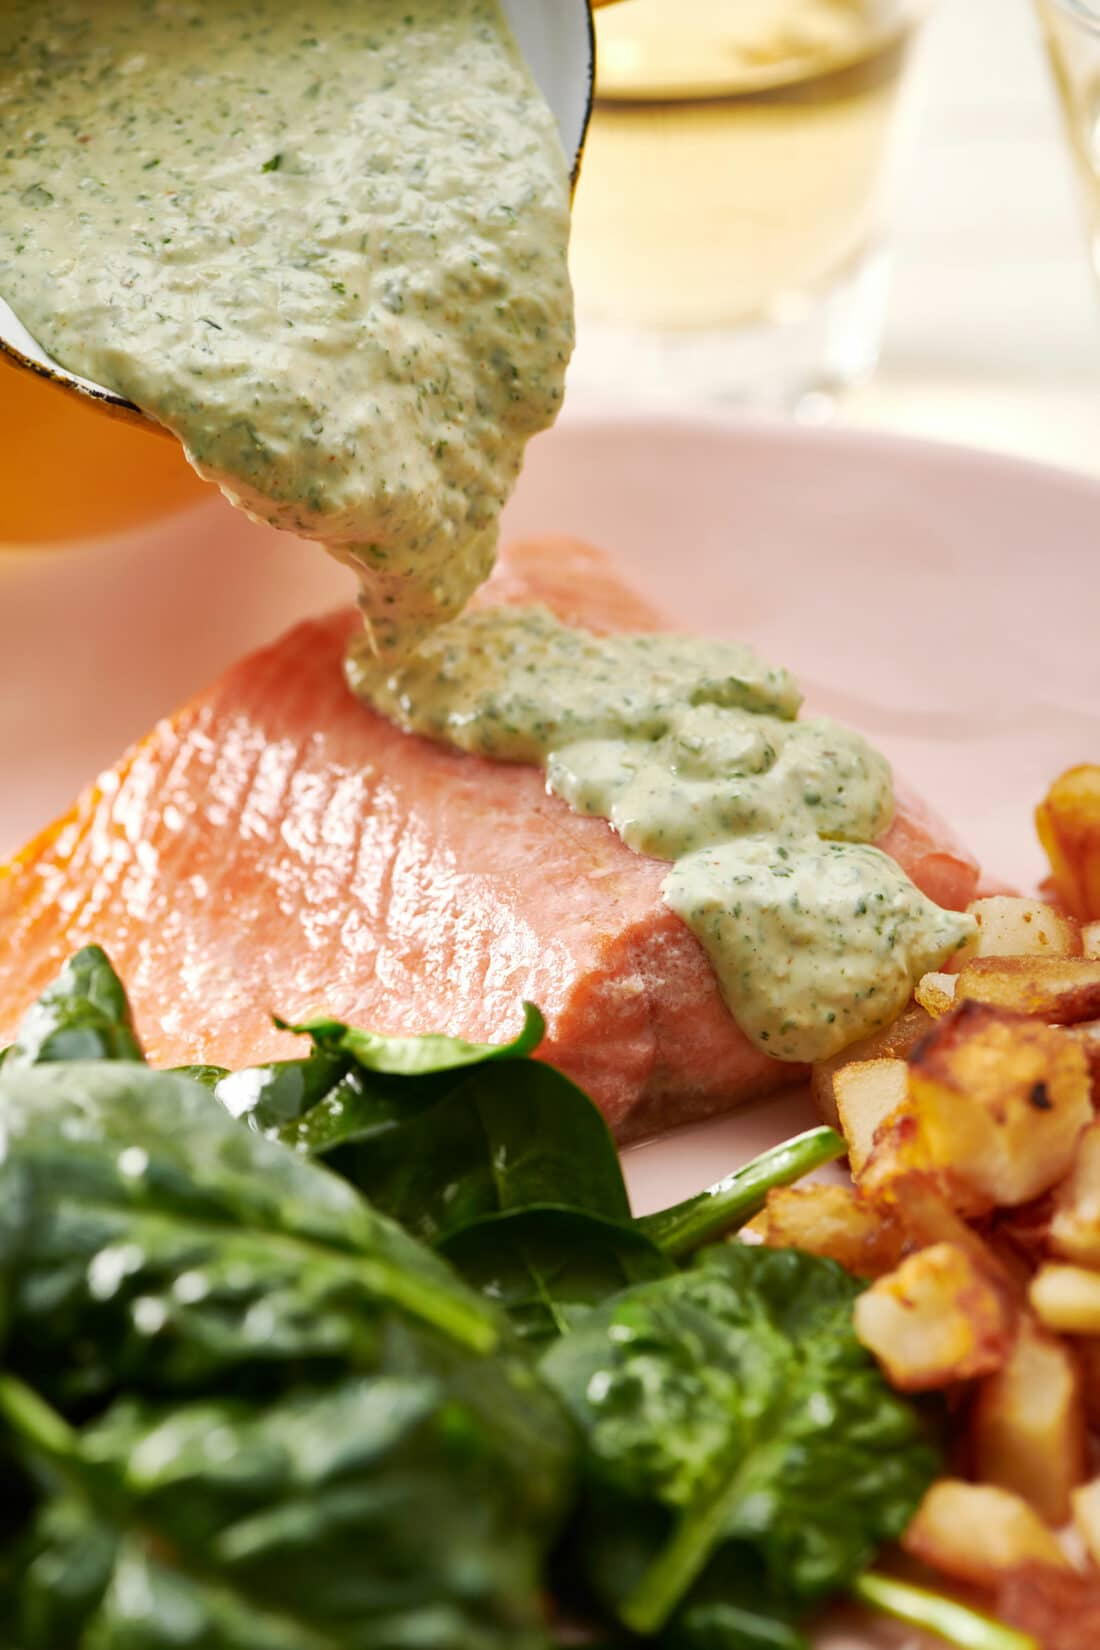 Poached Salmon with Cilantro Sauce